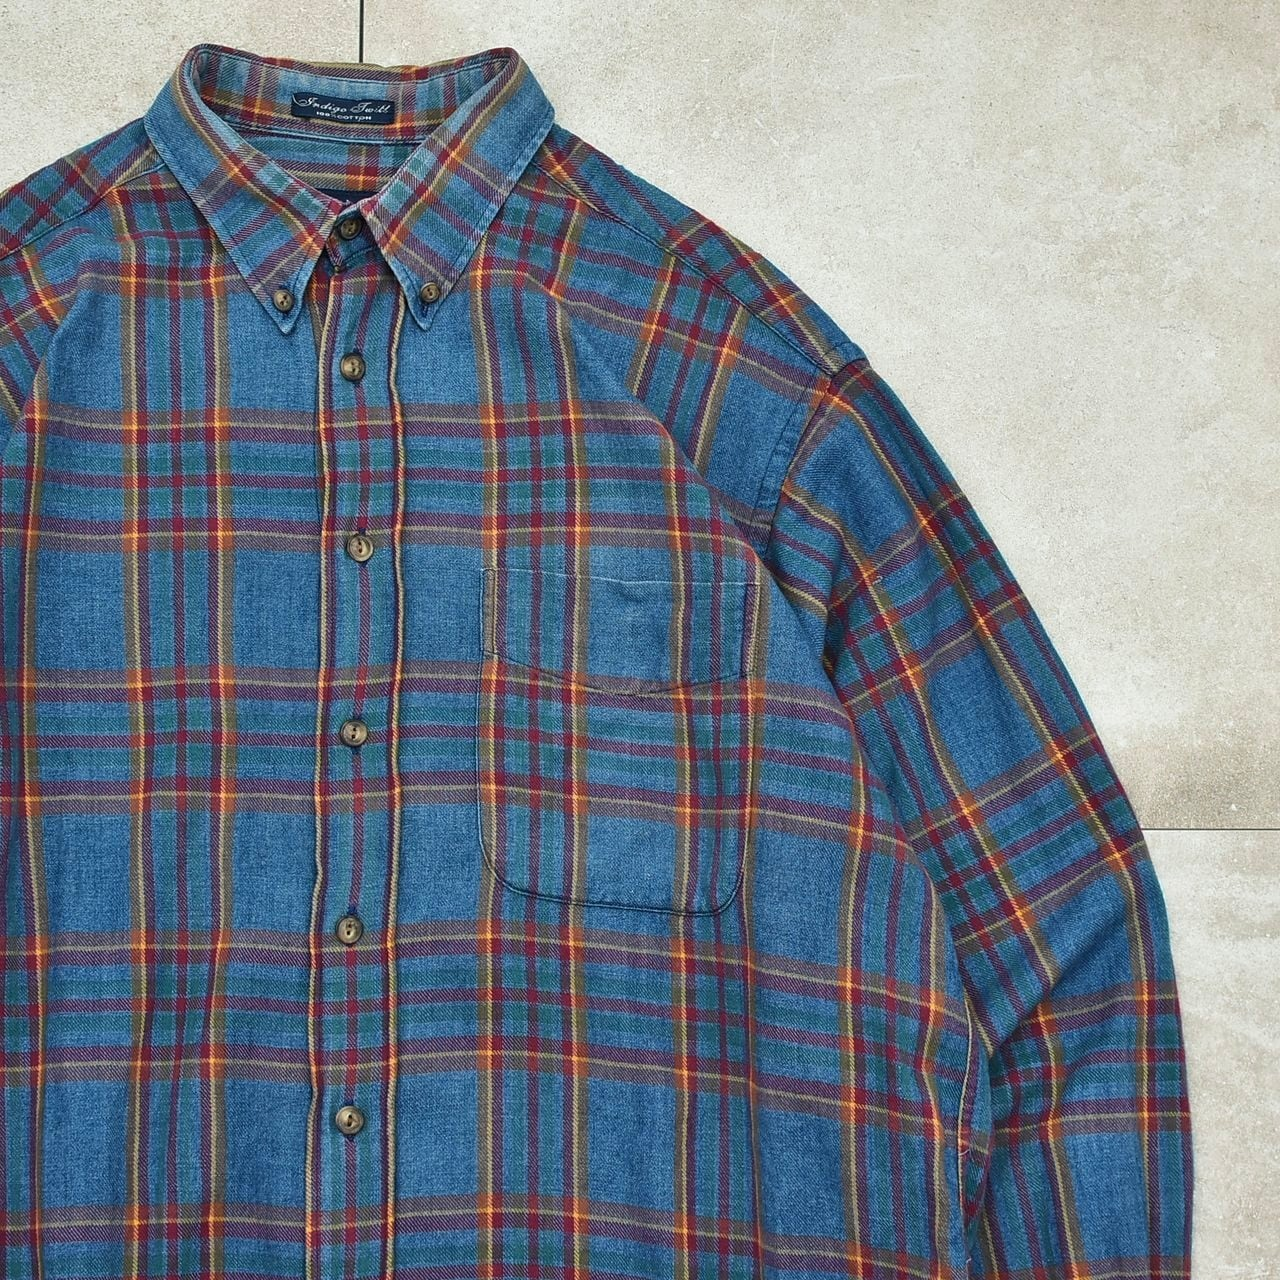 90's〜 GANT dungaree denim check BD shirt